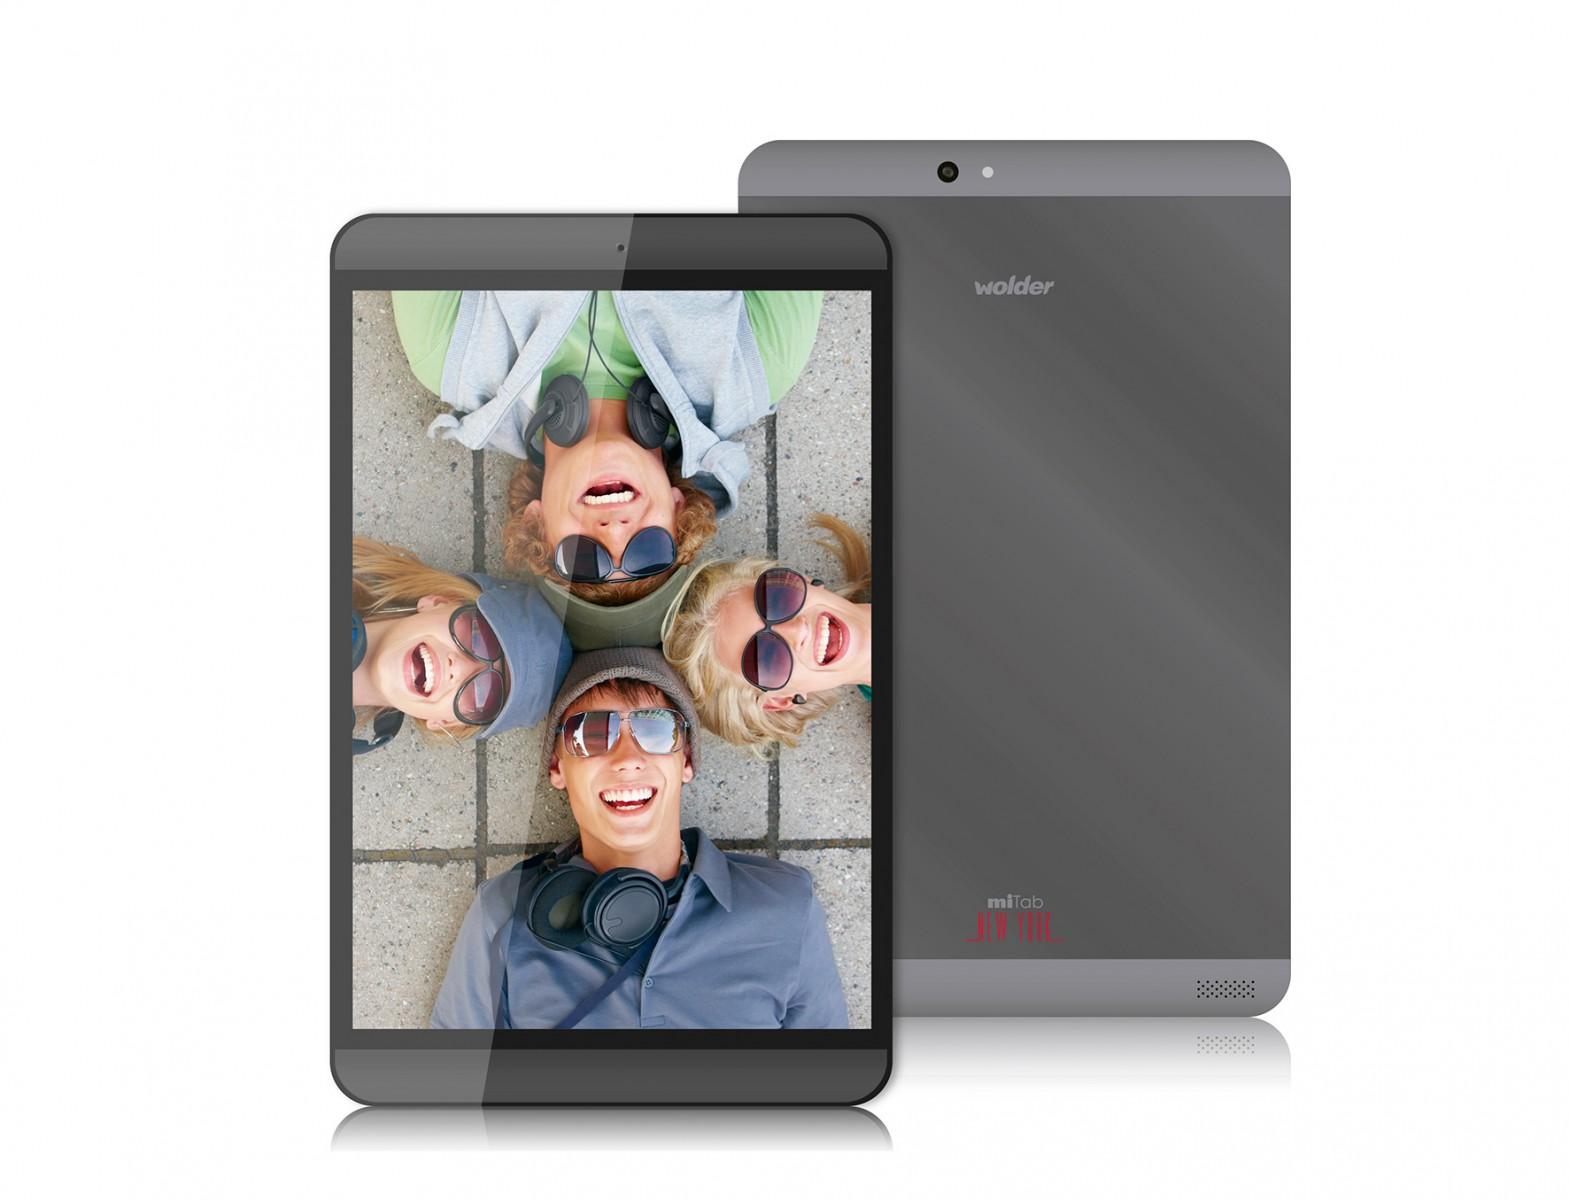 Wolder miTab New York, tablet Octa Core y pantalla Retina